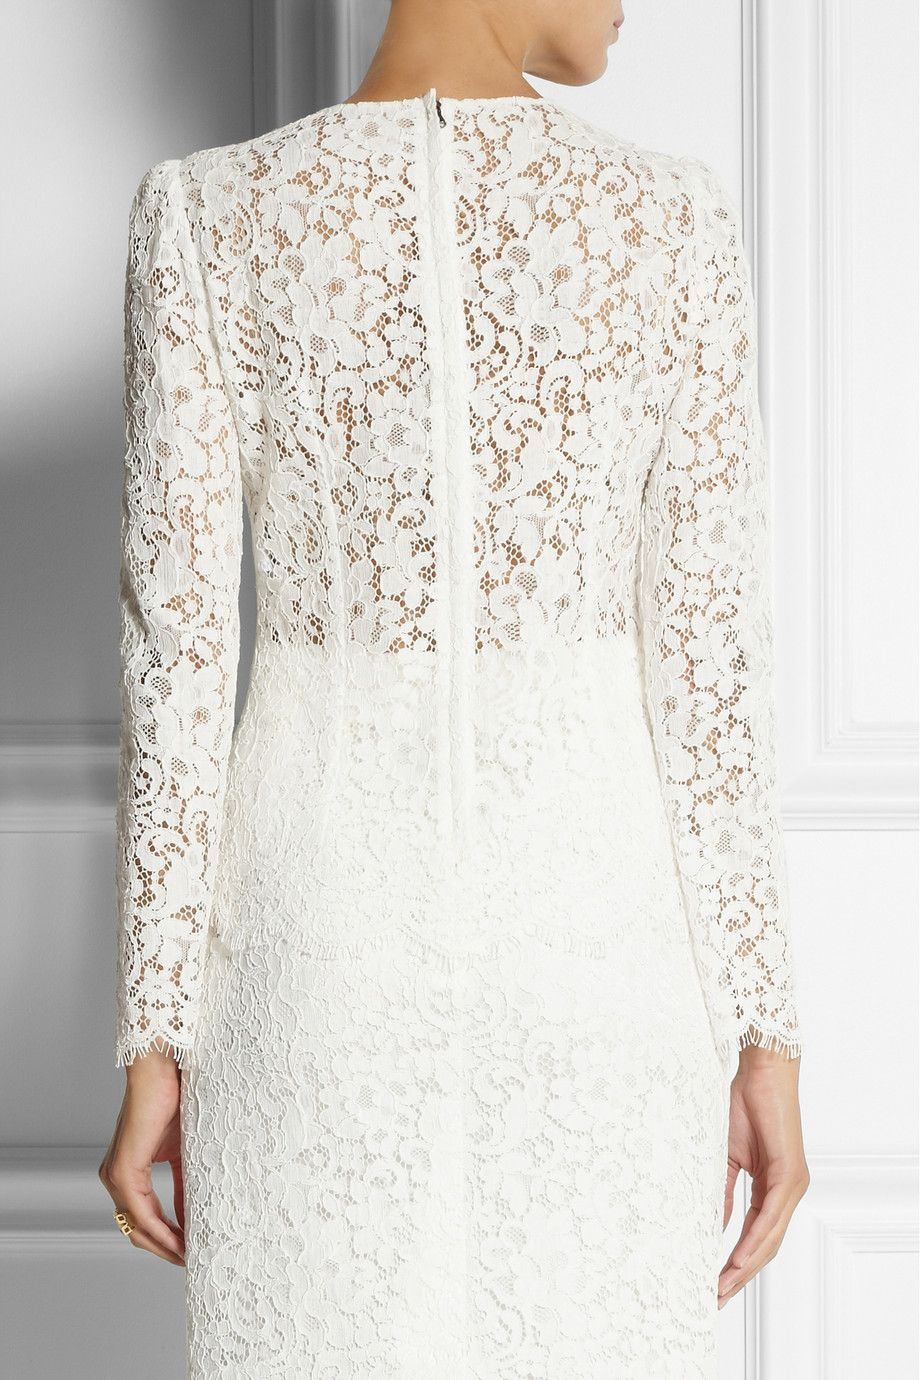 Dolce & Gabbana Cotton-blend lace top NET-A-PORTER.COM